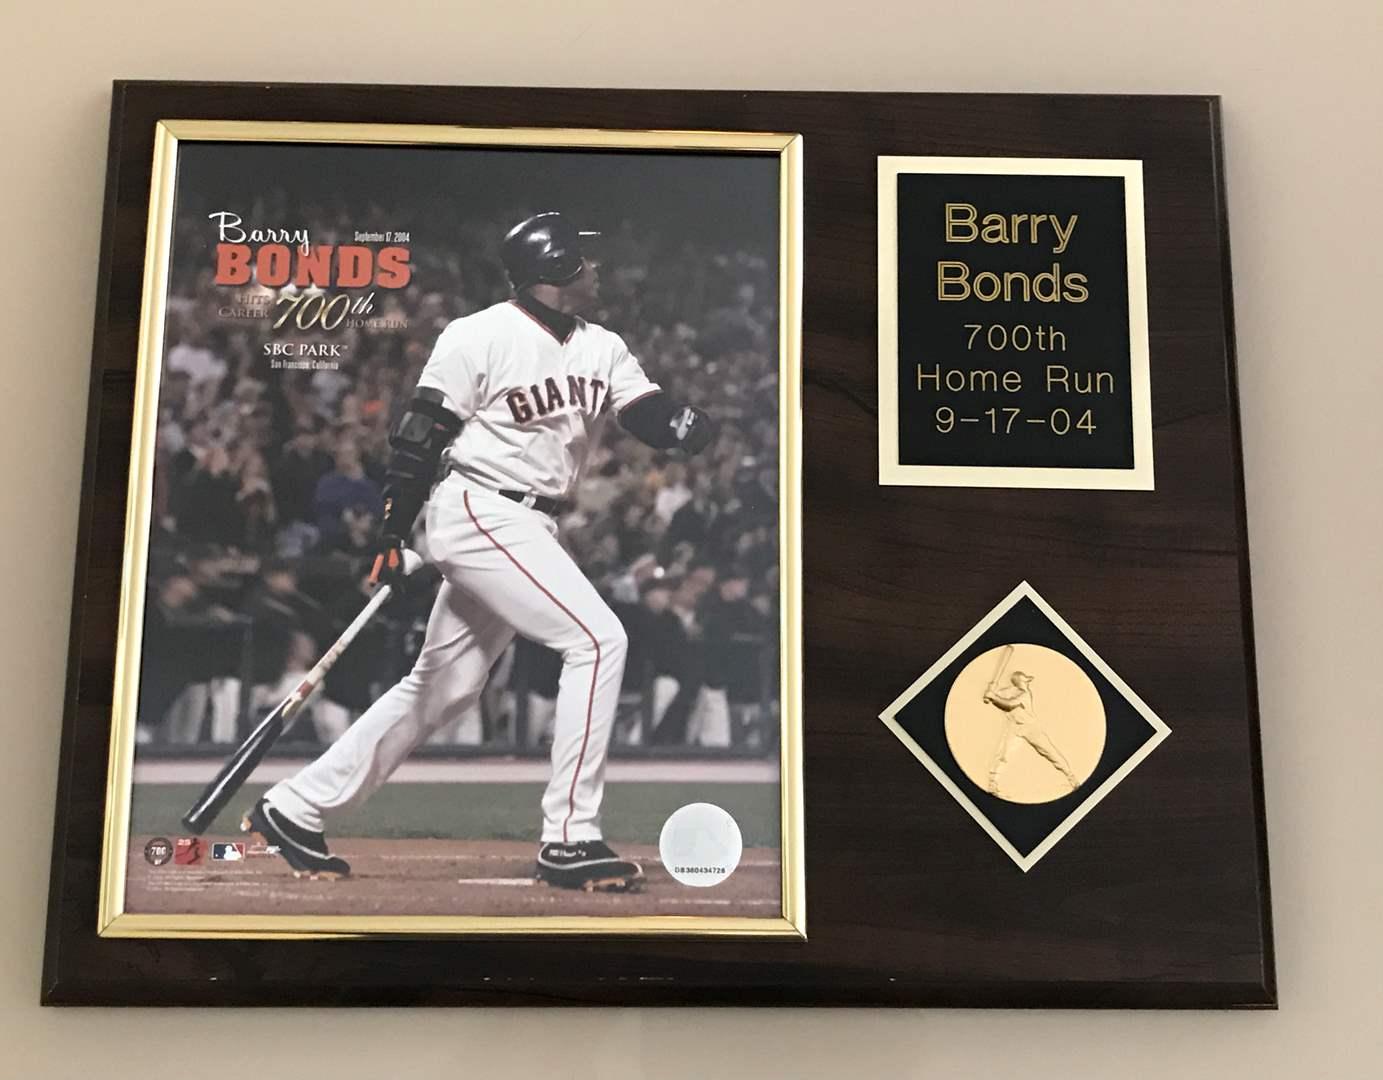 Lot # 65 Barry Bonds 700th Home Run Wooden Plaque (main image)